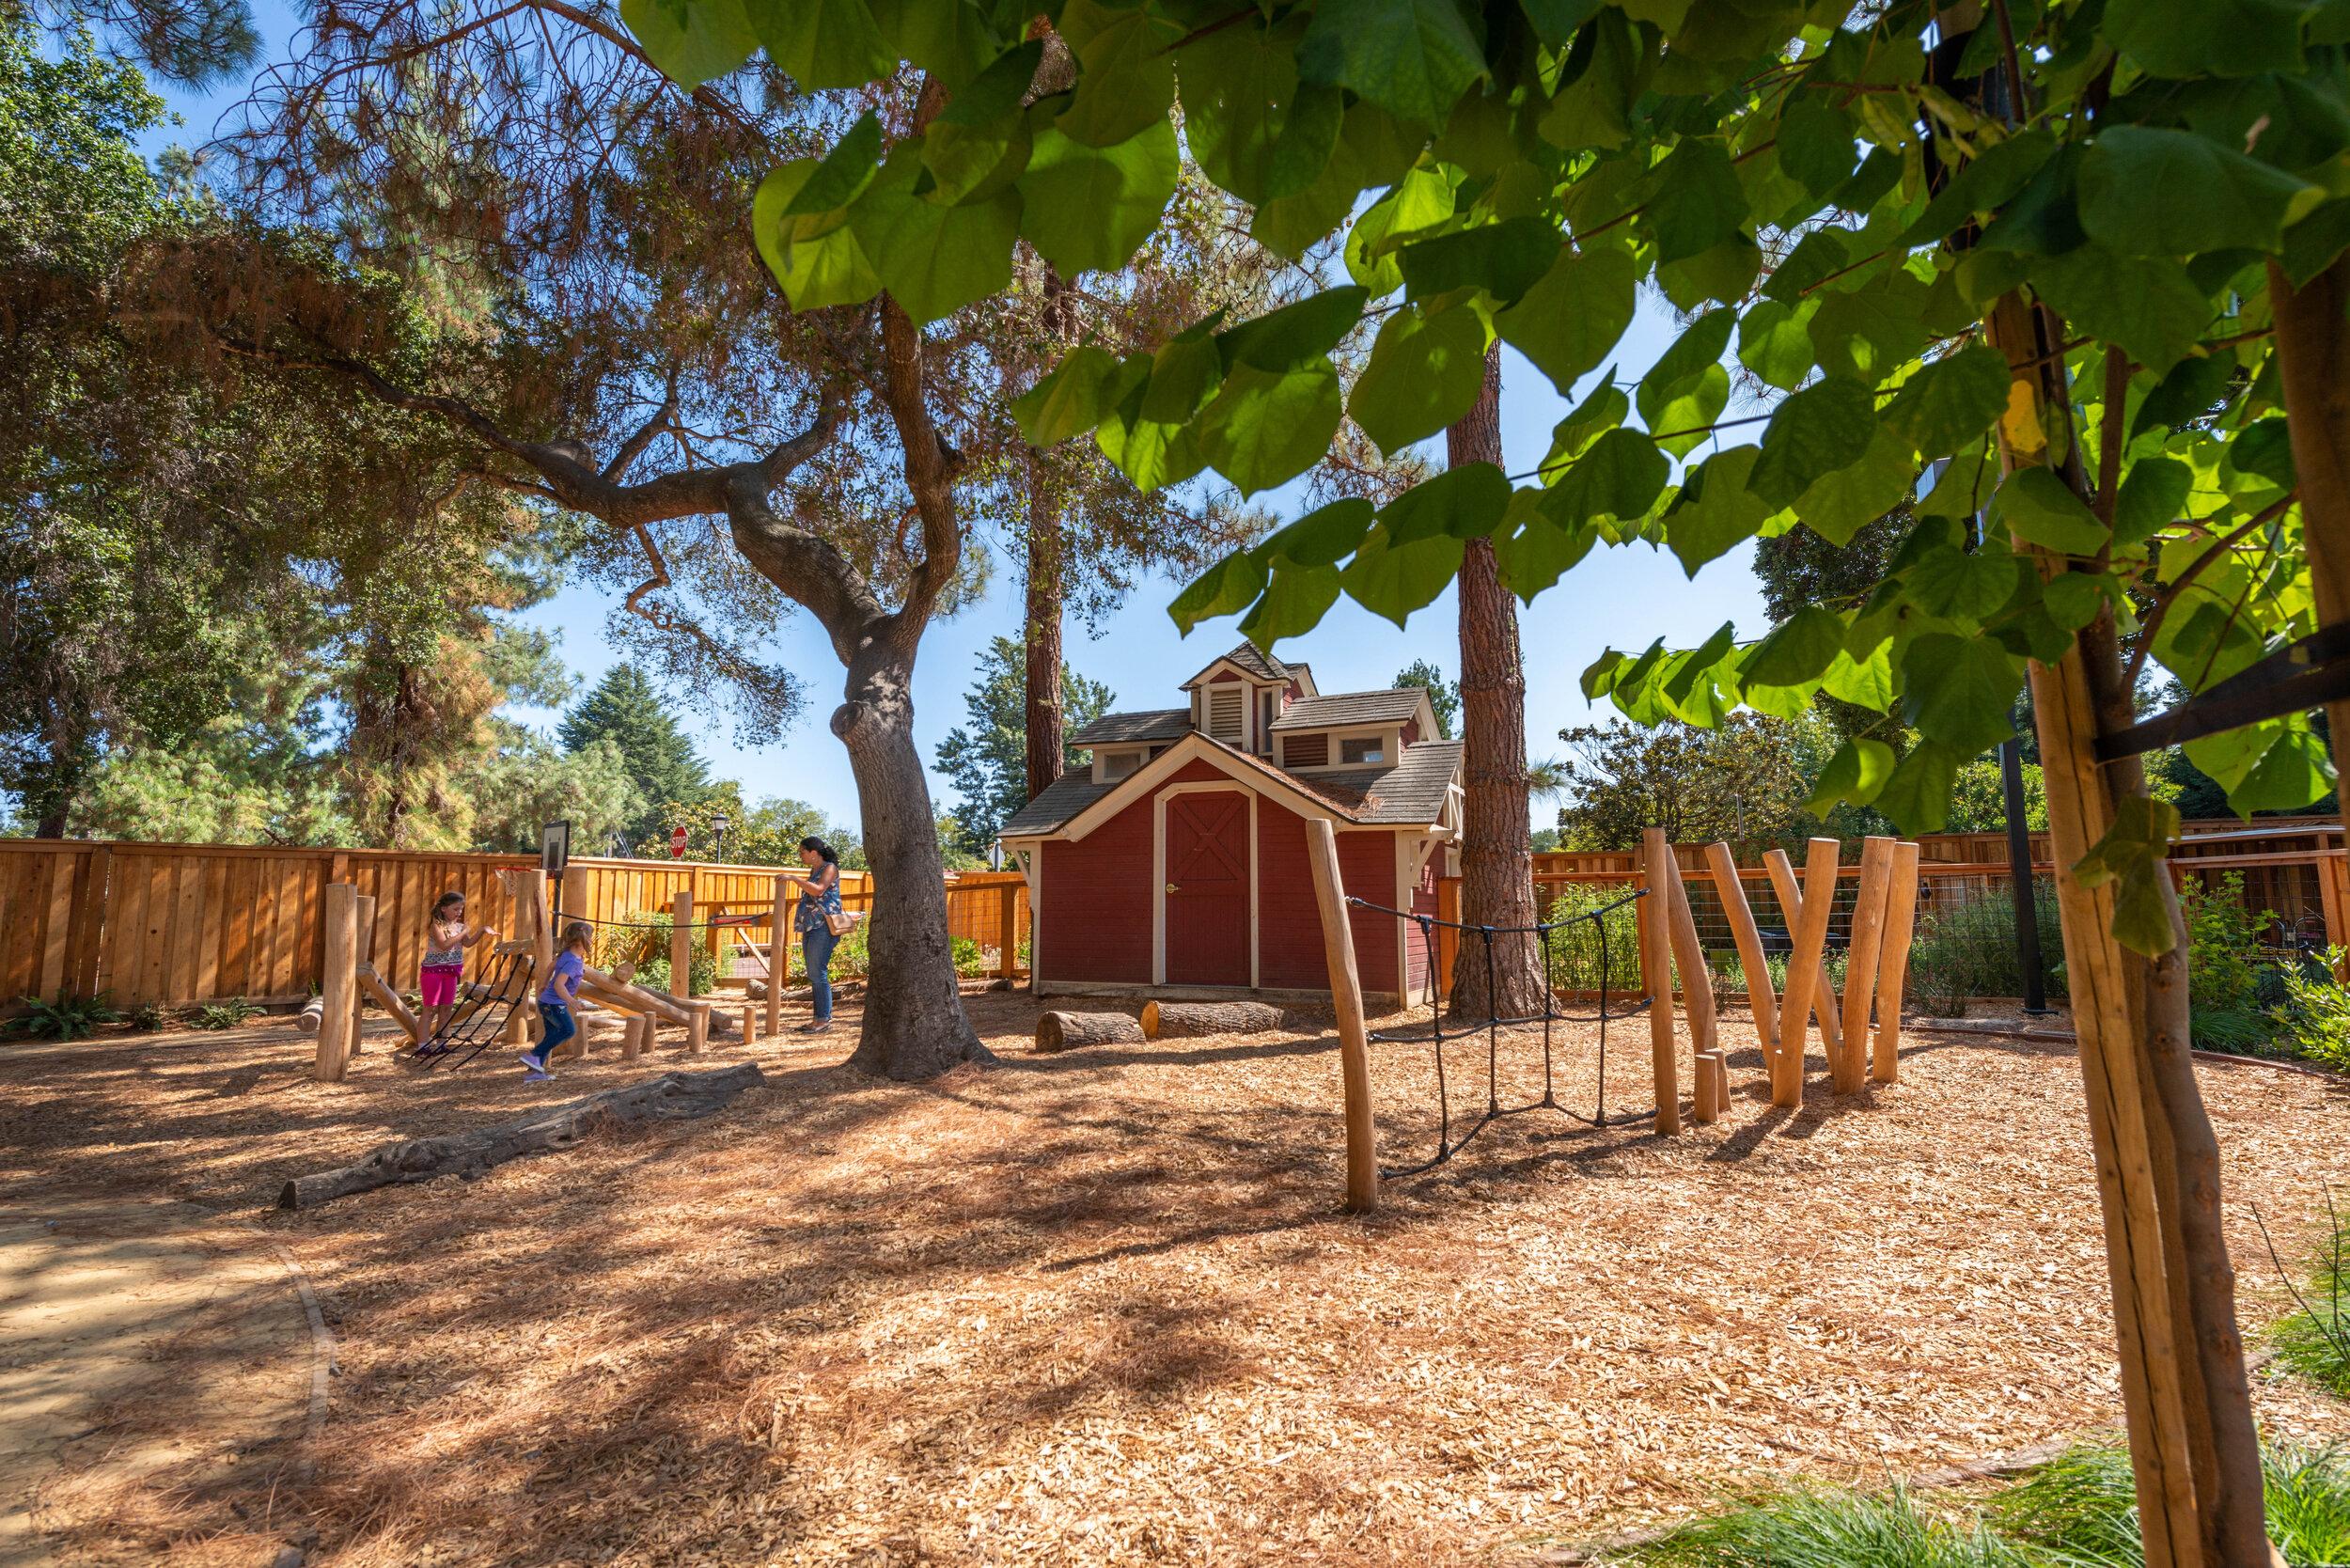 Childrens_Center_of_Stanford_Community_Preschool-28_lo.jpg